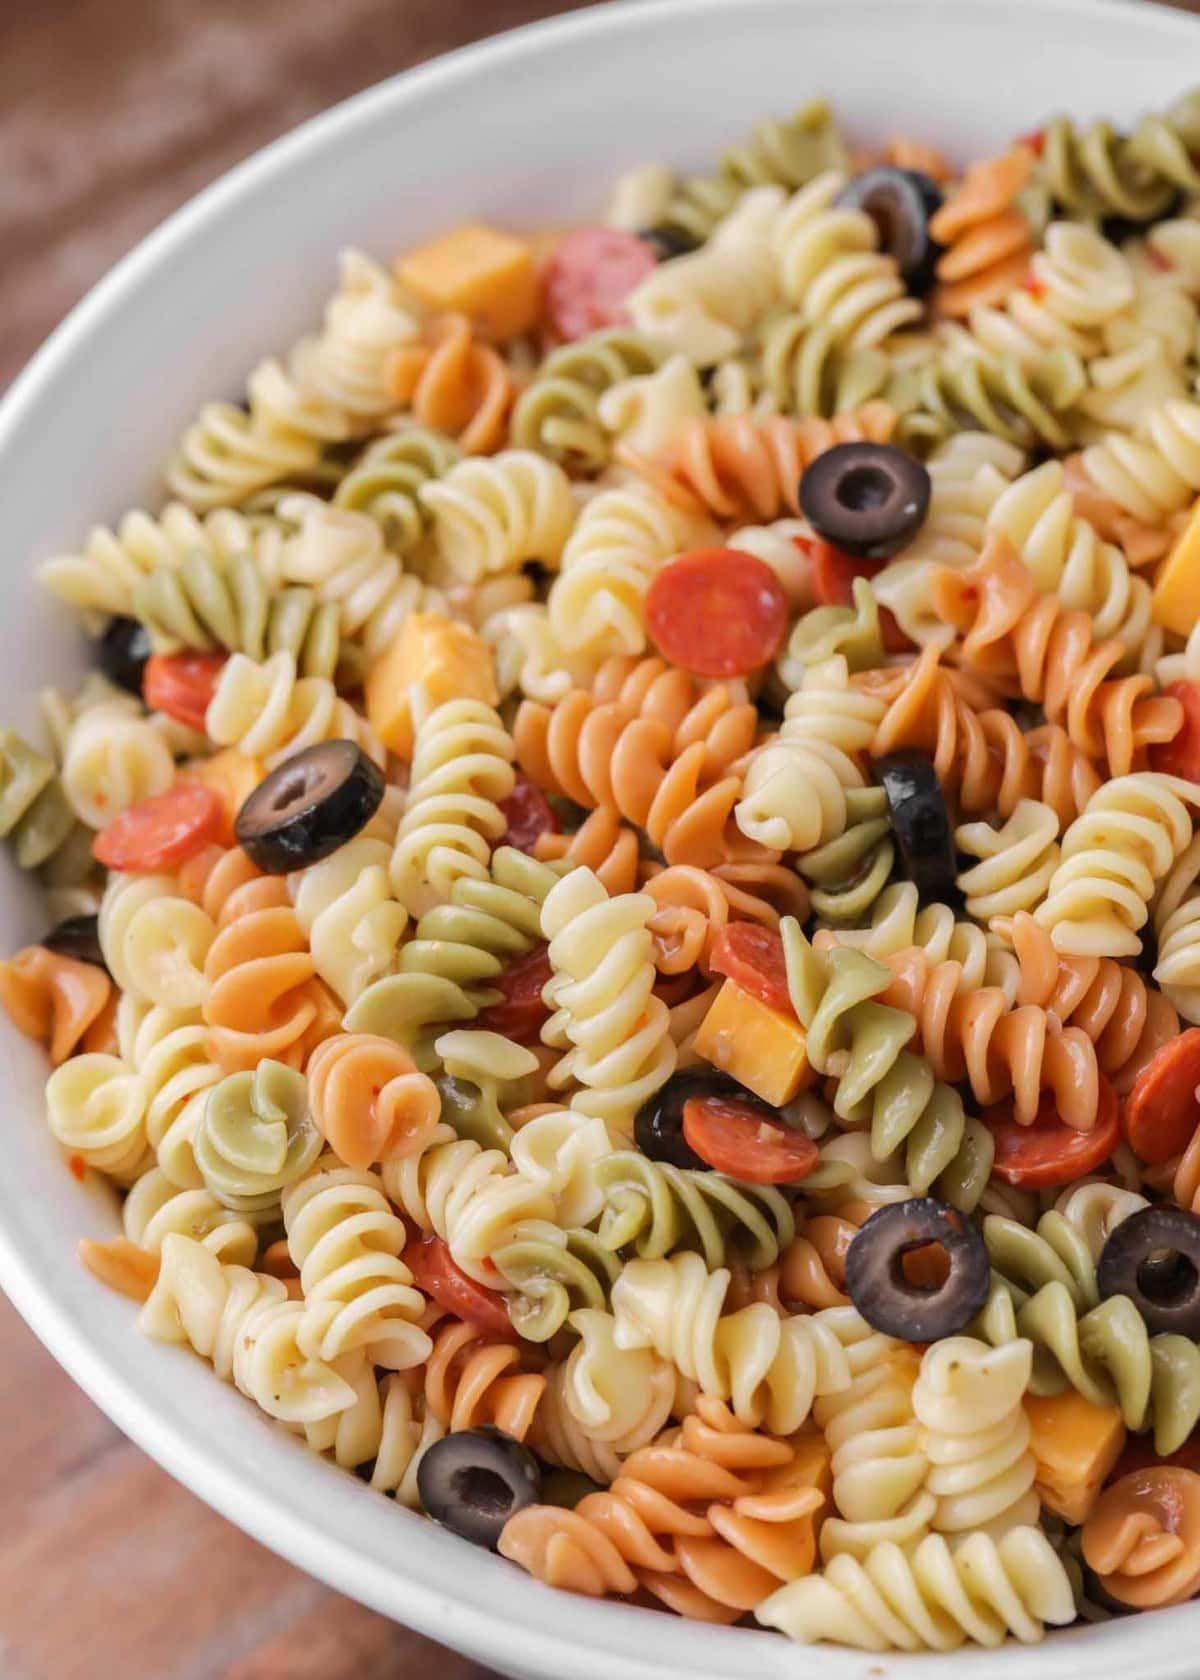 Easy Pasta Salad Recipe With Italian Dressing Video Lil Luna Recipe Easy Pasta Cold Pasta Salad Recipes Pasta Salad Recipes